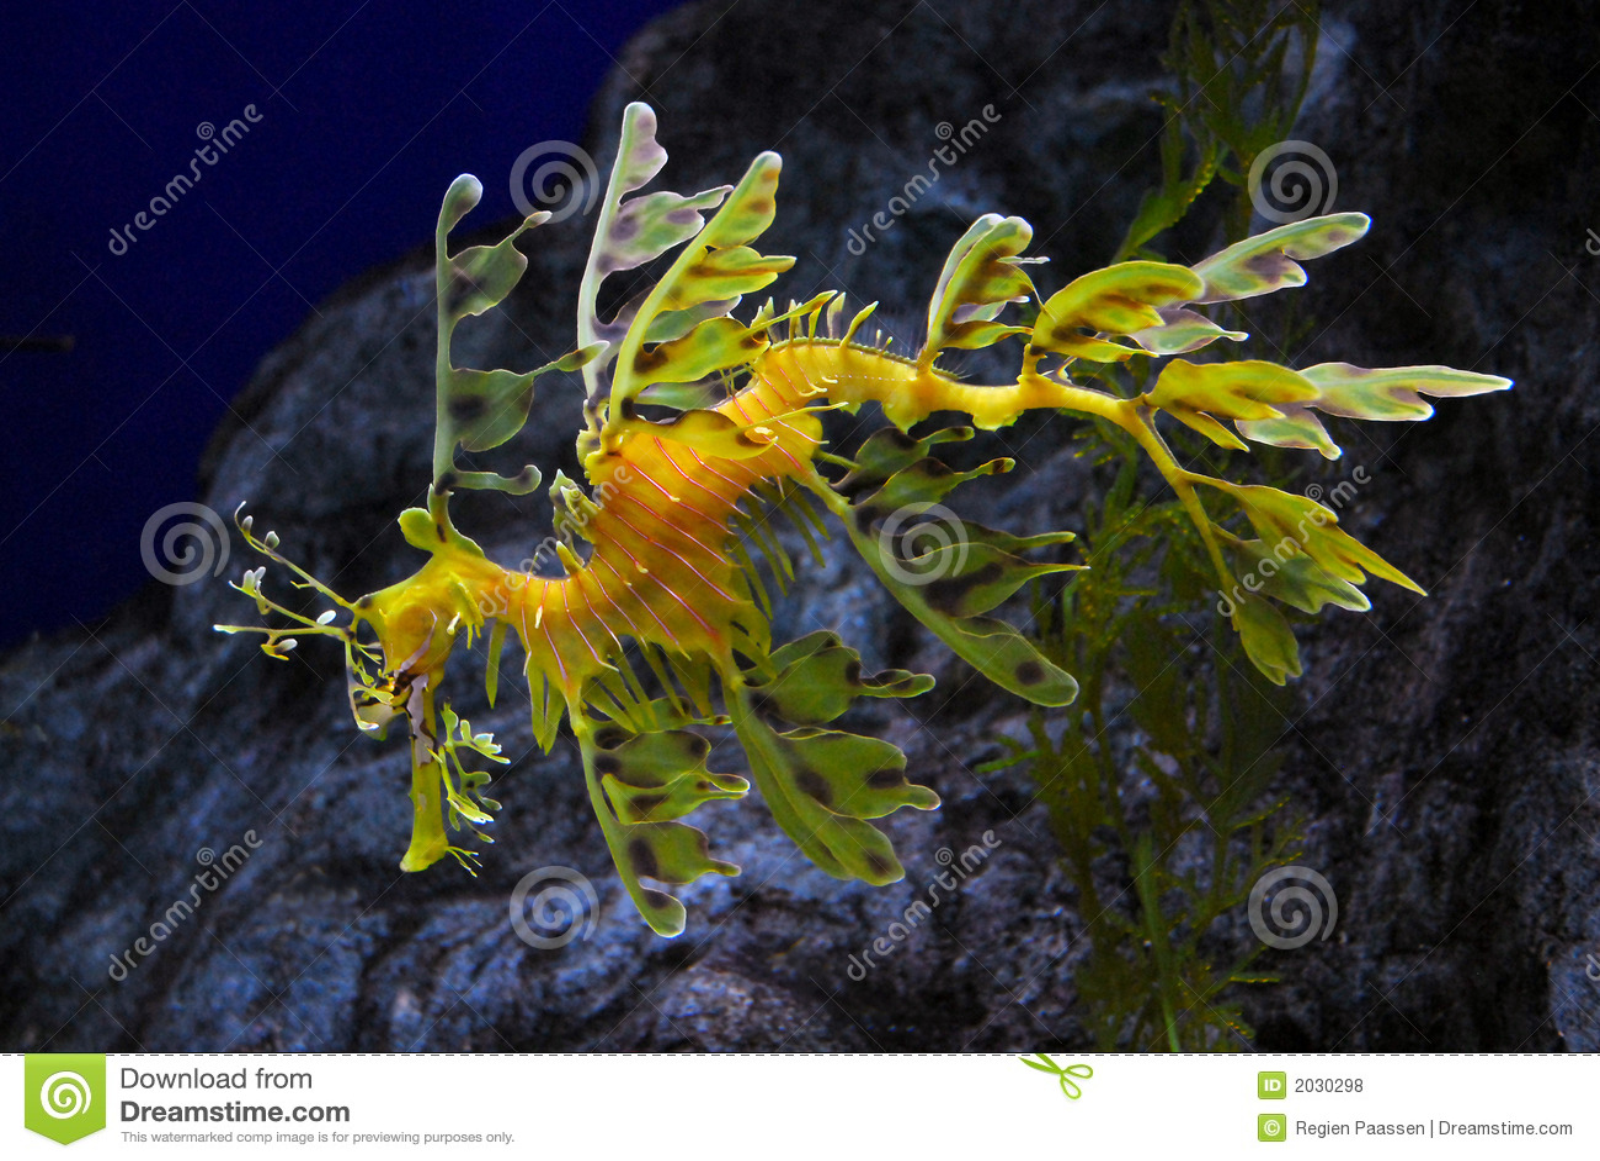 Lövrik seadragon